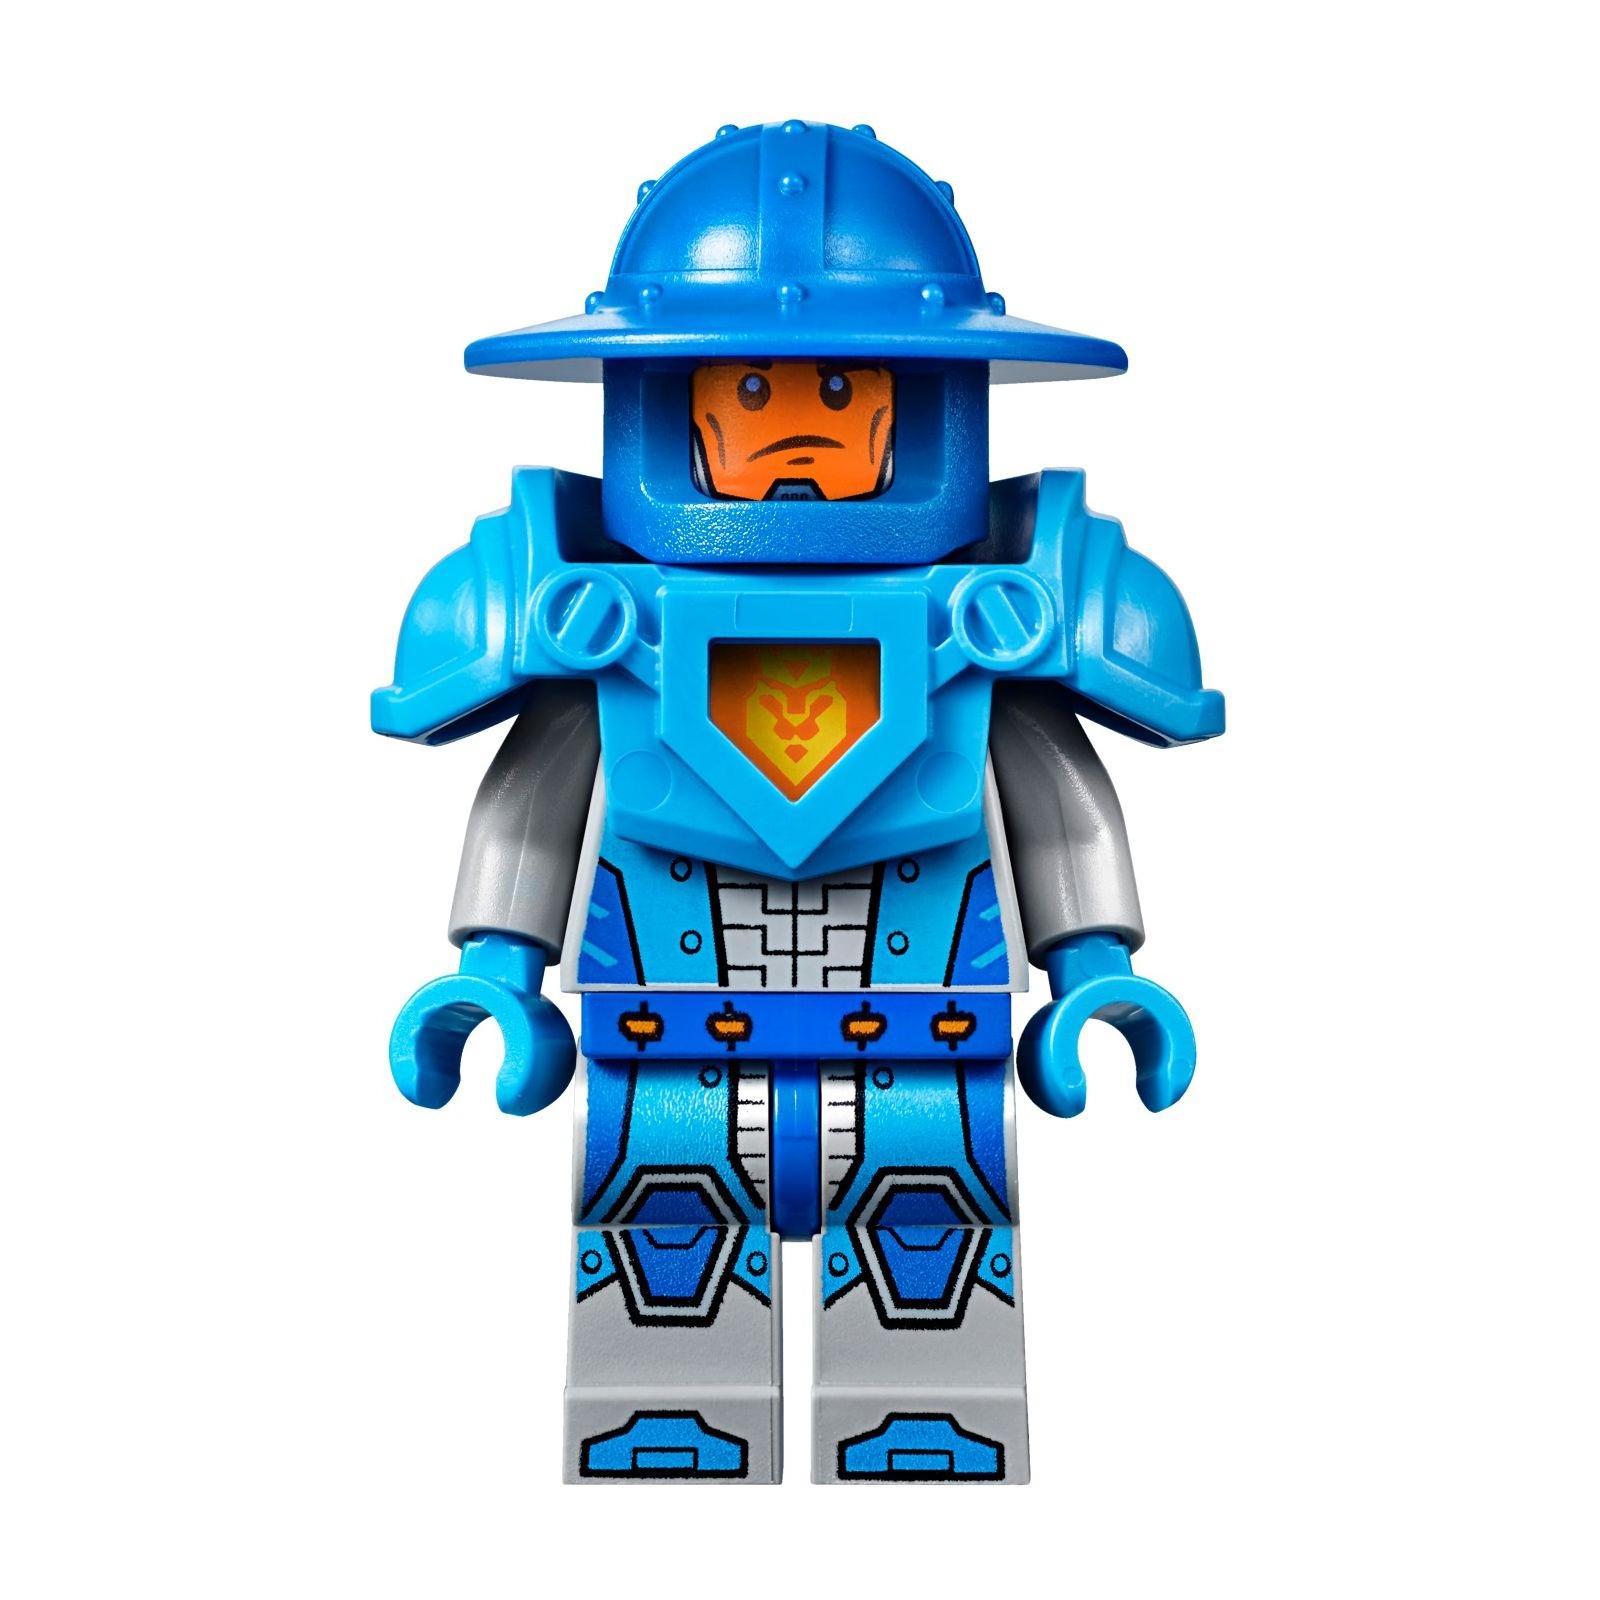 Конструктор LEGO Nexo Knights Королевский боевой бластер (70310) изображение 7